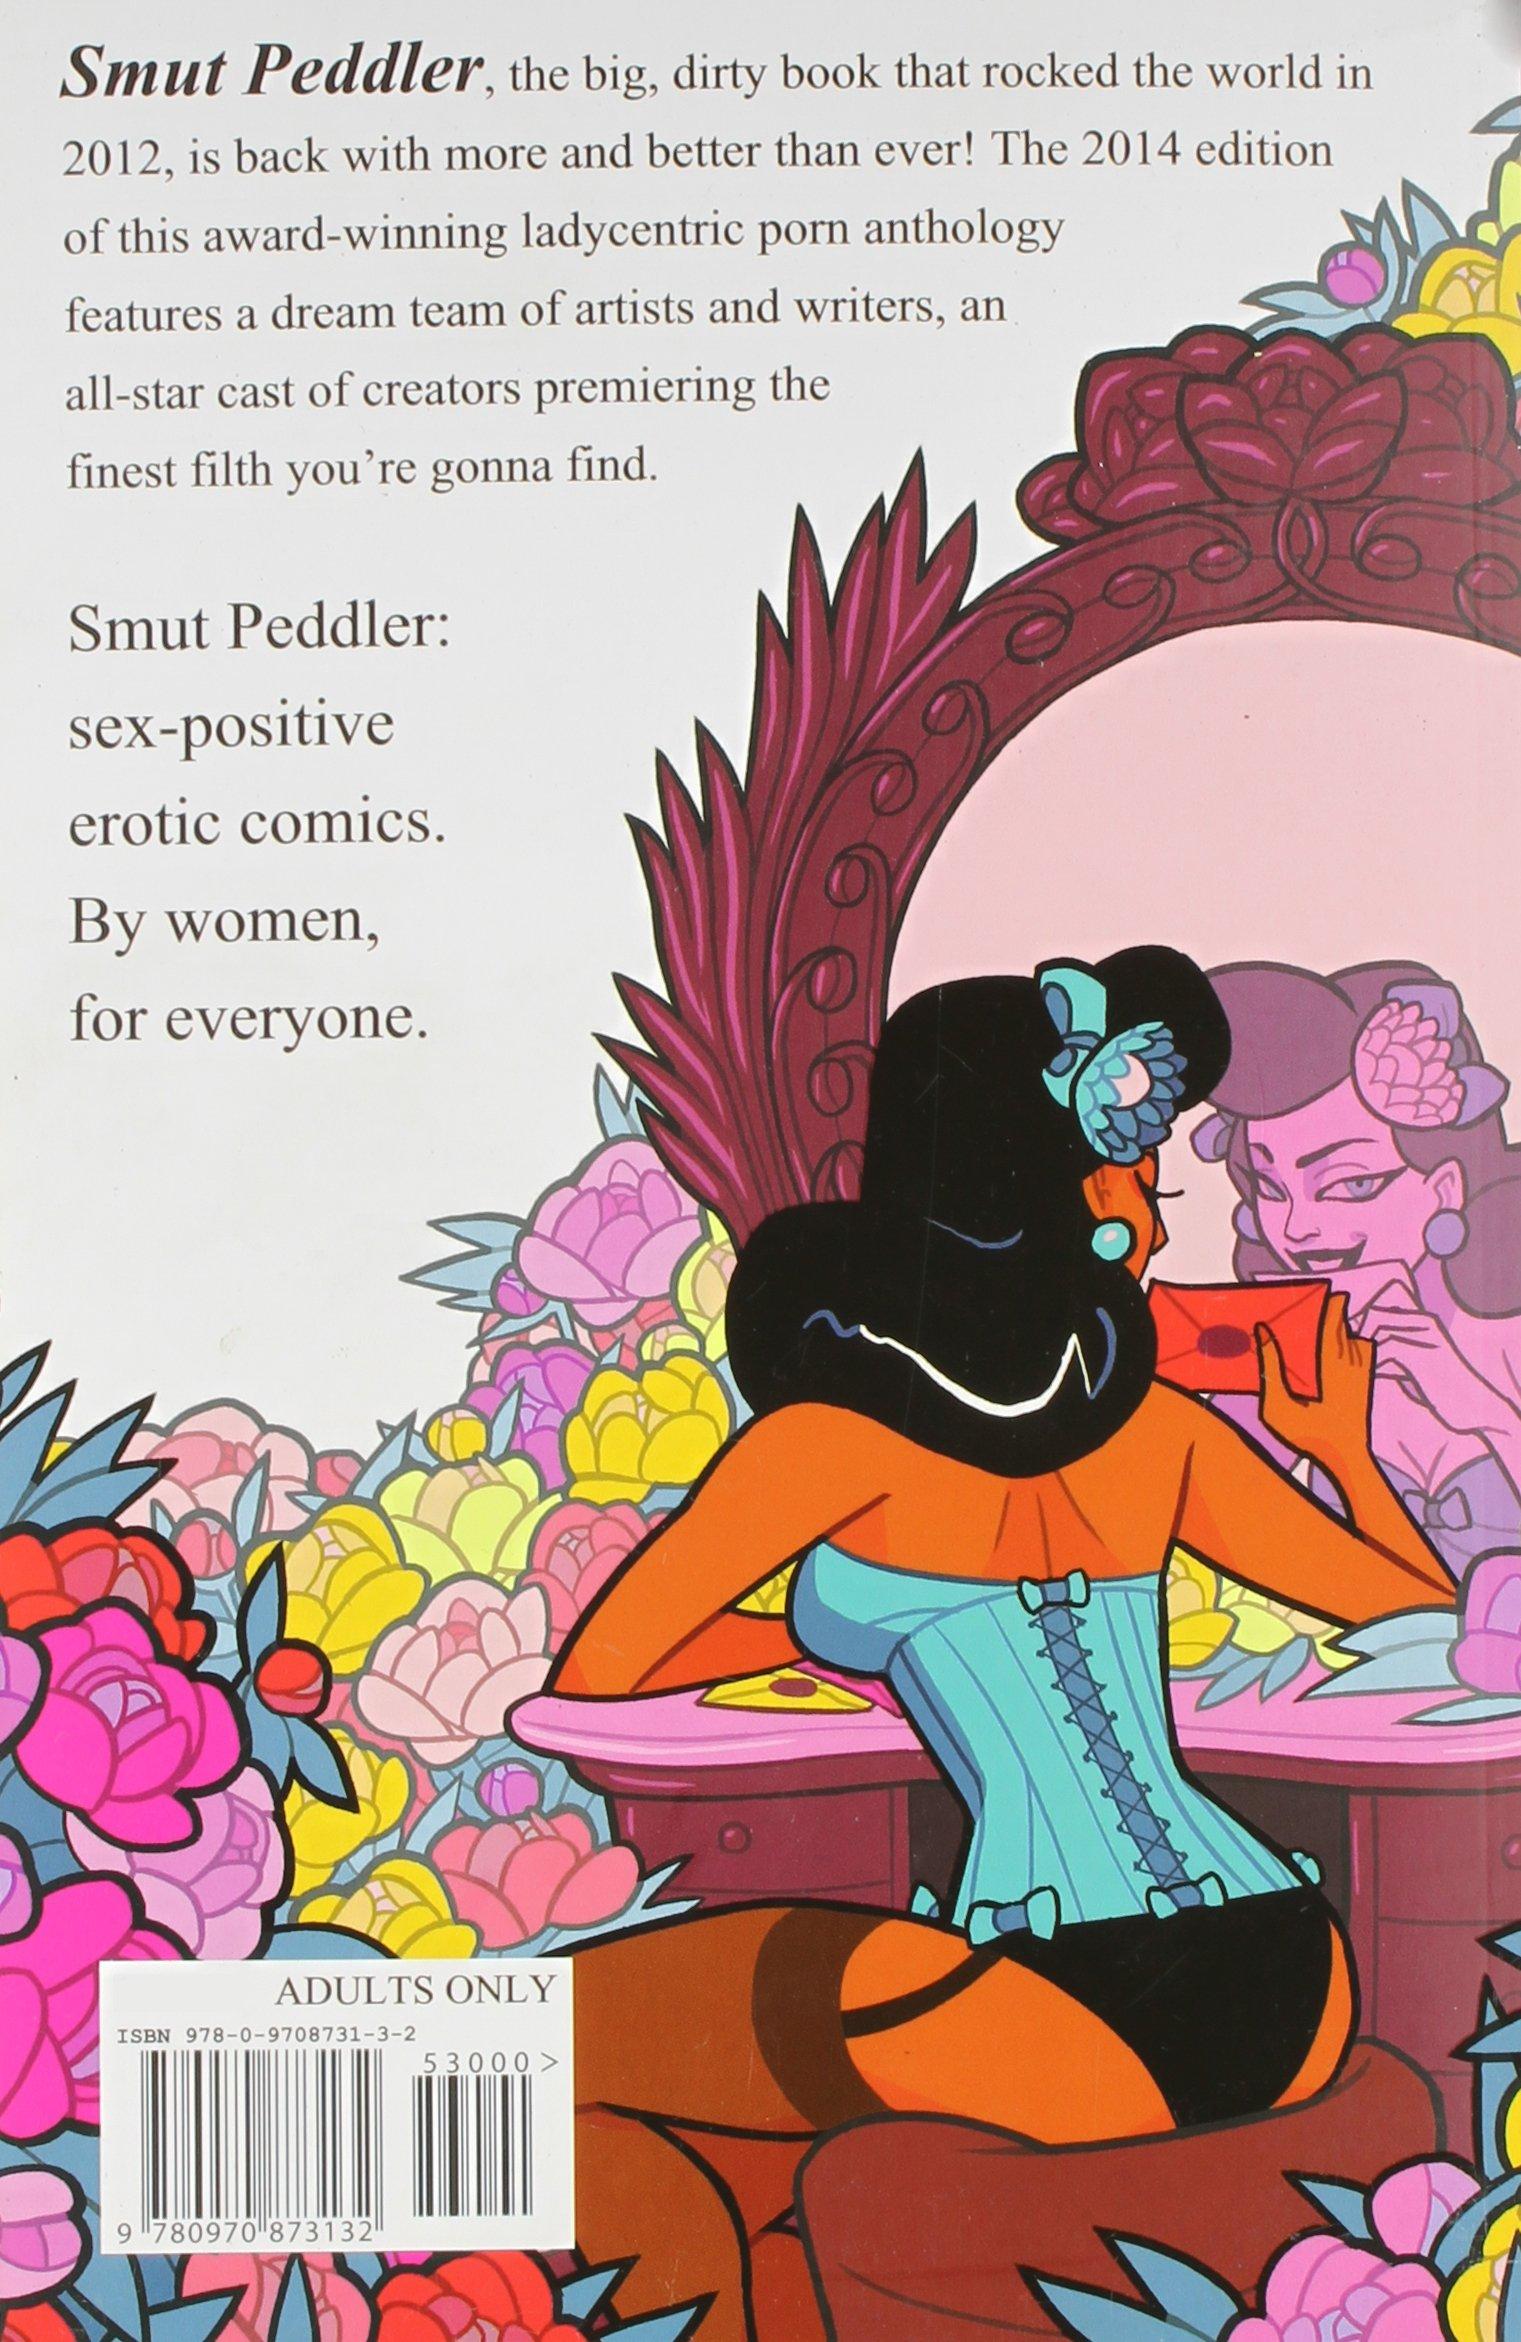 Smut Peddler 2014 Edition A Superior Pornucopia For Classy Dames And The Forward Thinking Gentleman C Spike Trotman Johanna Draper Carlson